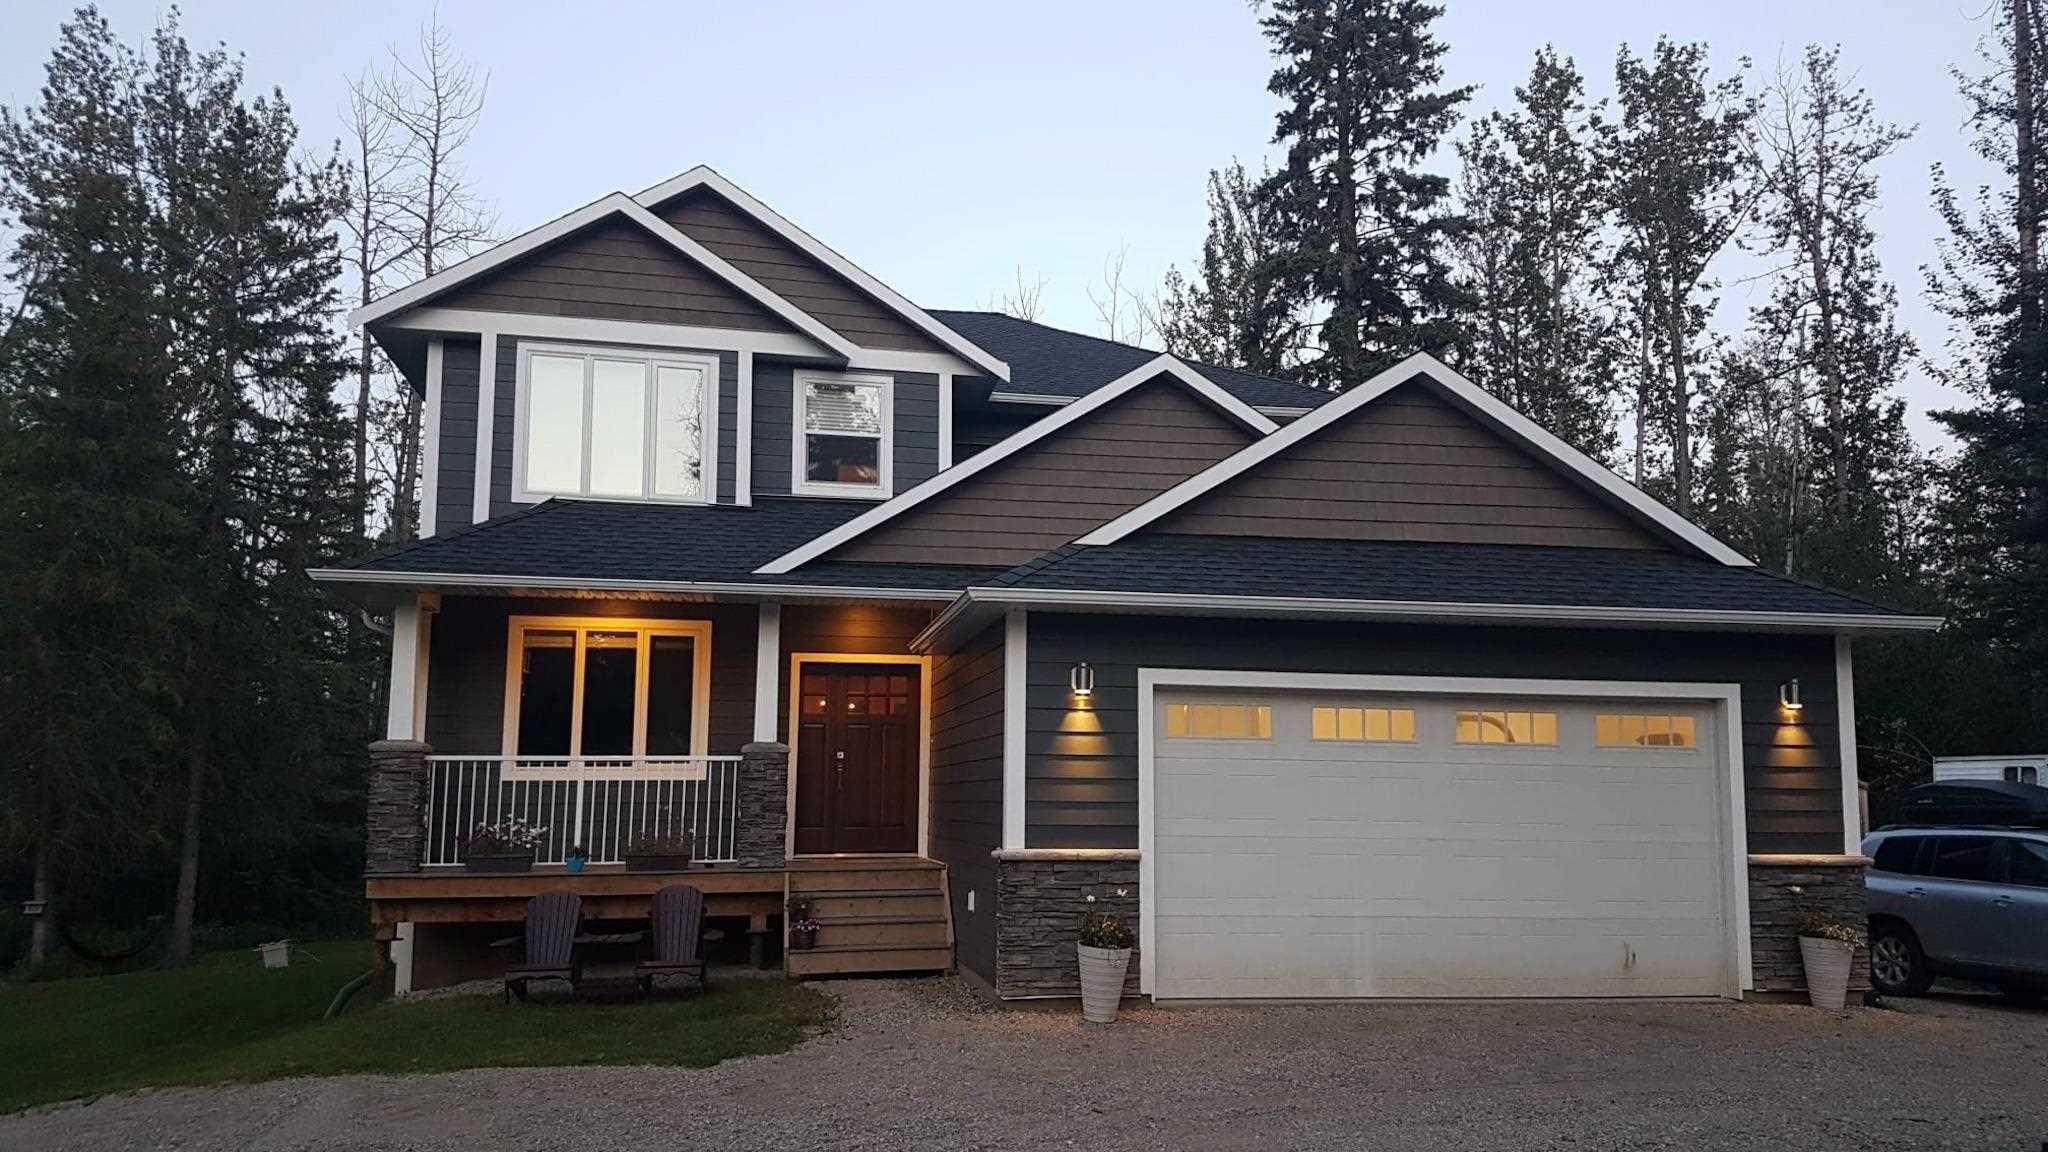 Main Photo: 13585 281 Road in Fort St. John: Charlie Lake House for sale (Fort St. John (Zone 60))  : MLS®# R2607201